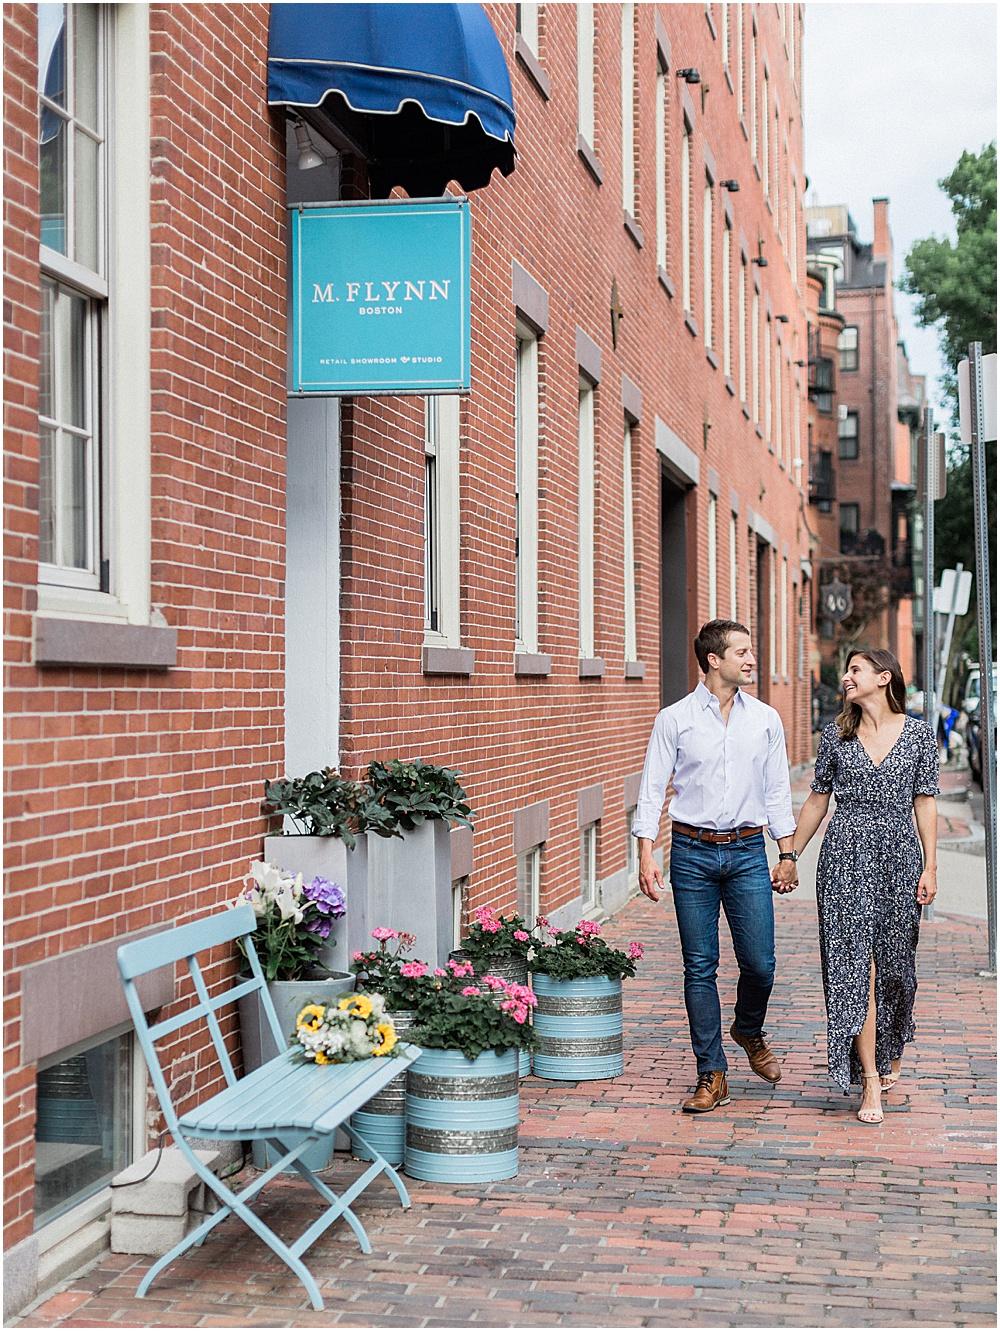 south_end_m_flynn_showroom_ring_oval_engagement_session_massachusetts_boston_wedding_photographer_meredith_jane_photography_photo_0473.jpg